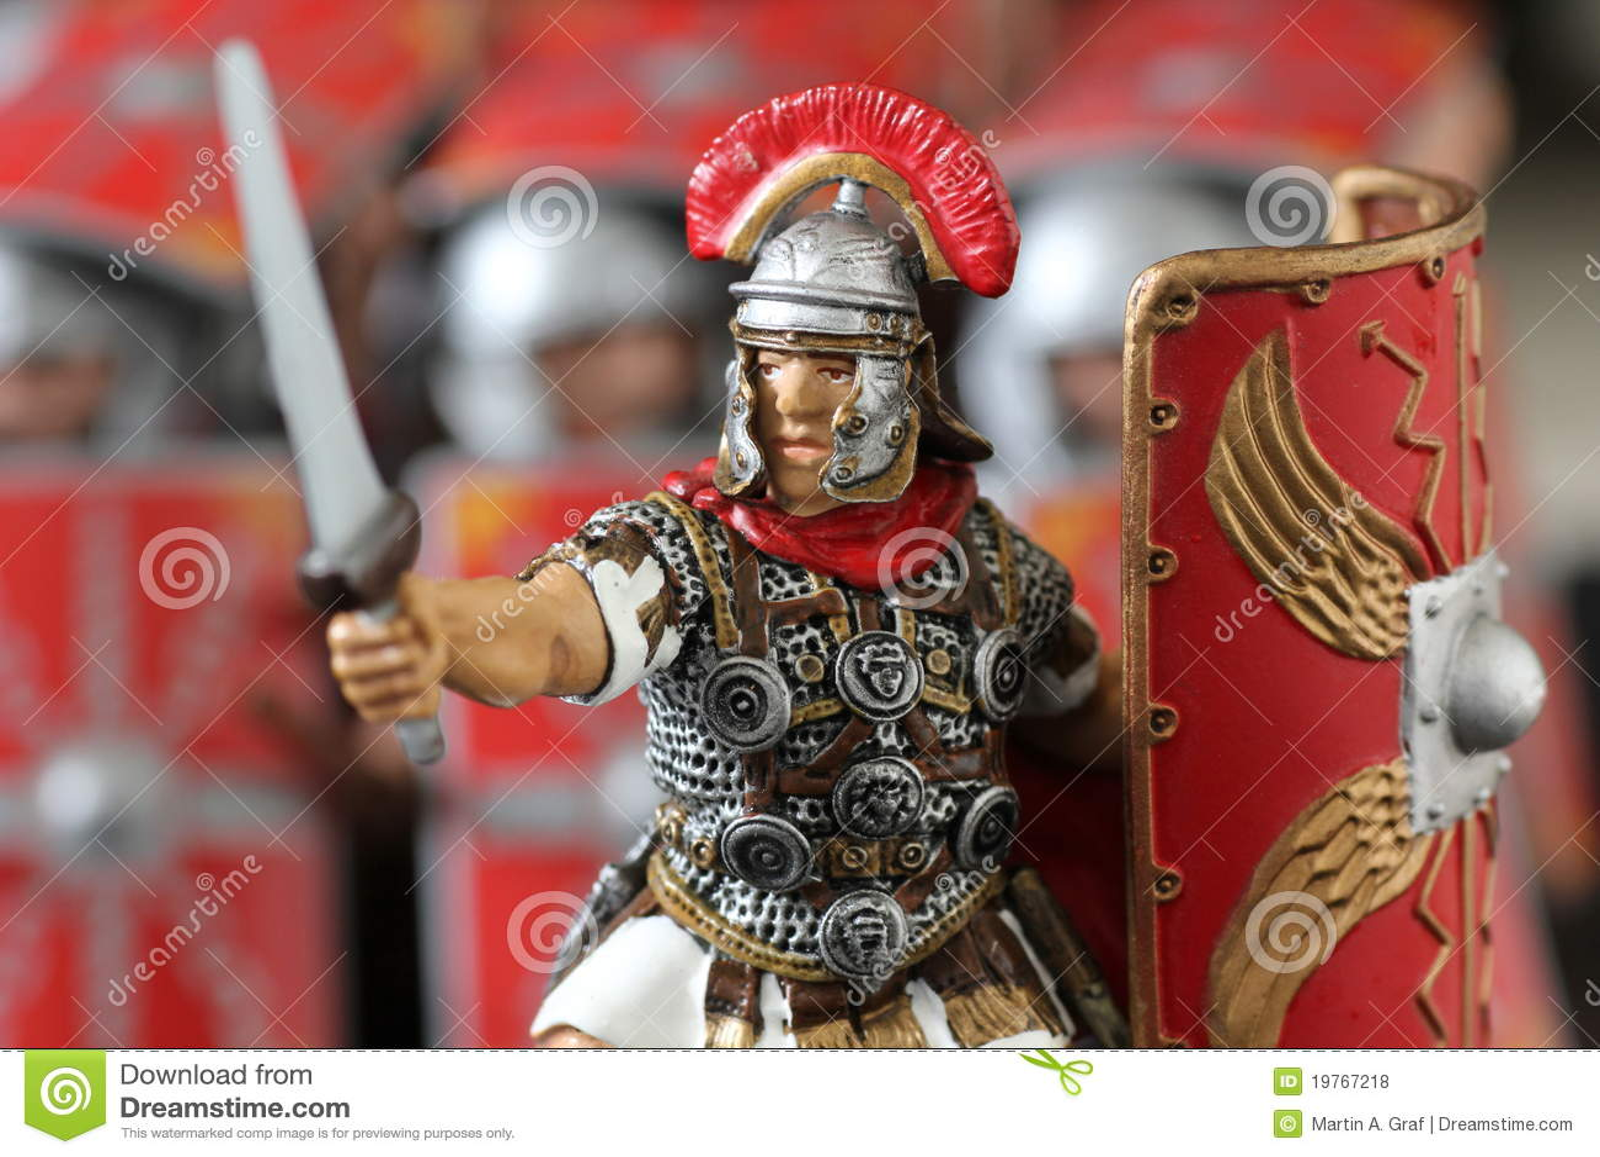 Roman Centurion Toy Figure Royalty Free Stock Photos